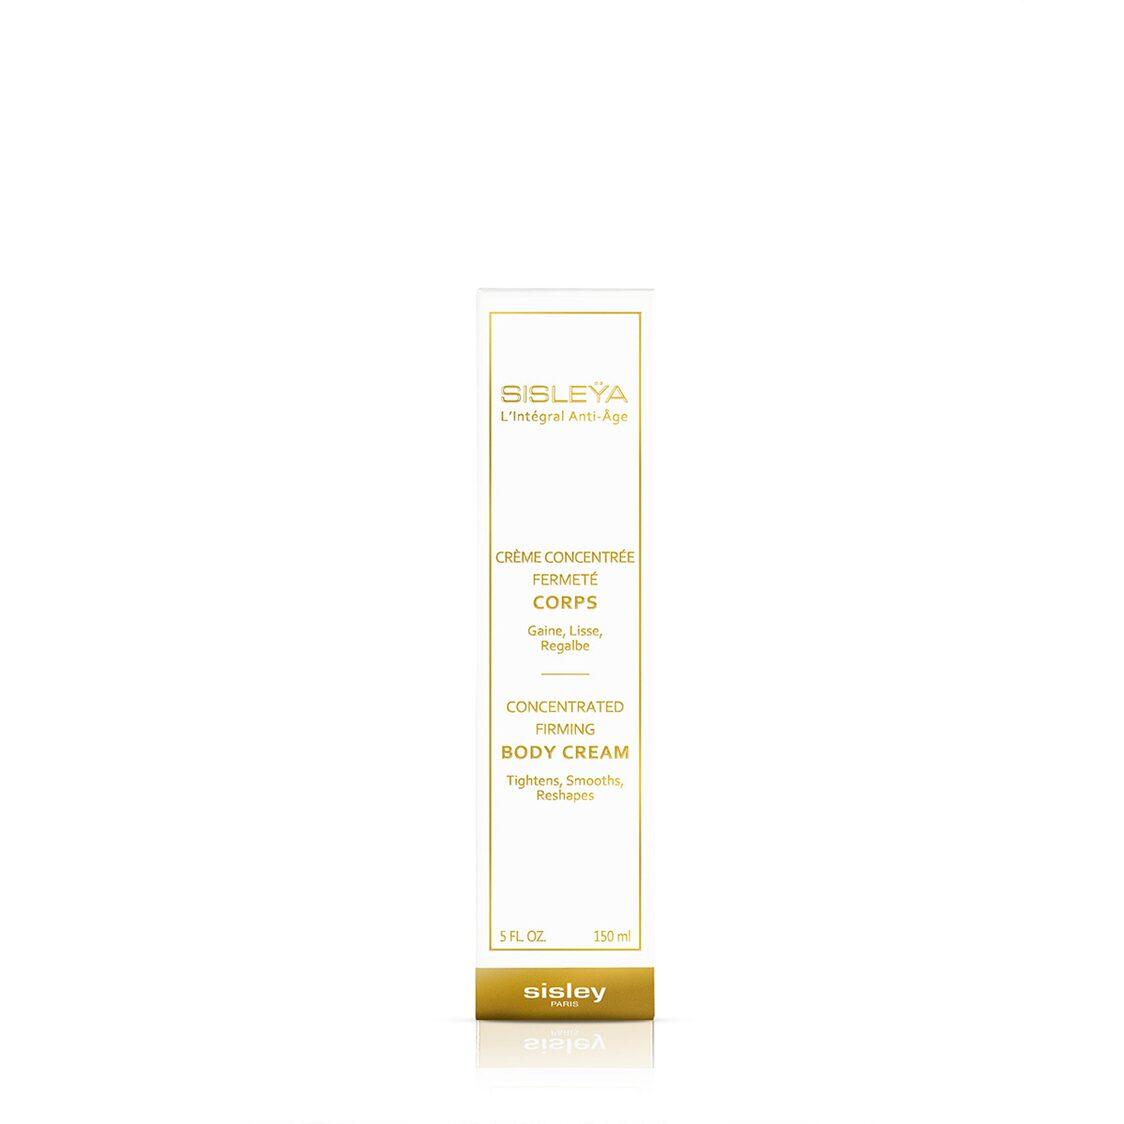 Sisley Sislea LIntgral Anti-ge Concentrated Firming Body Cream